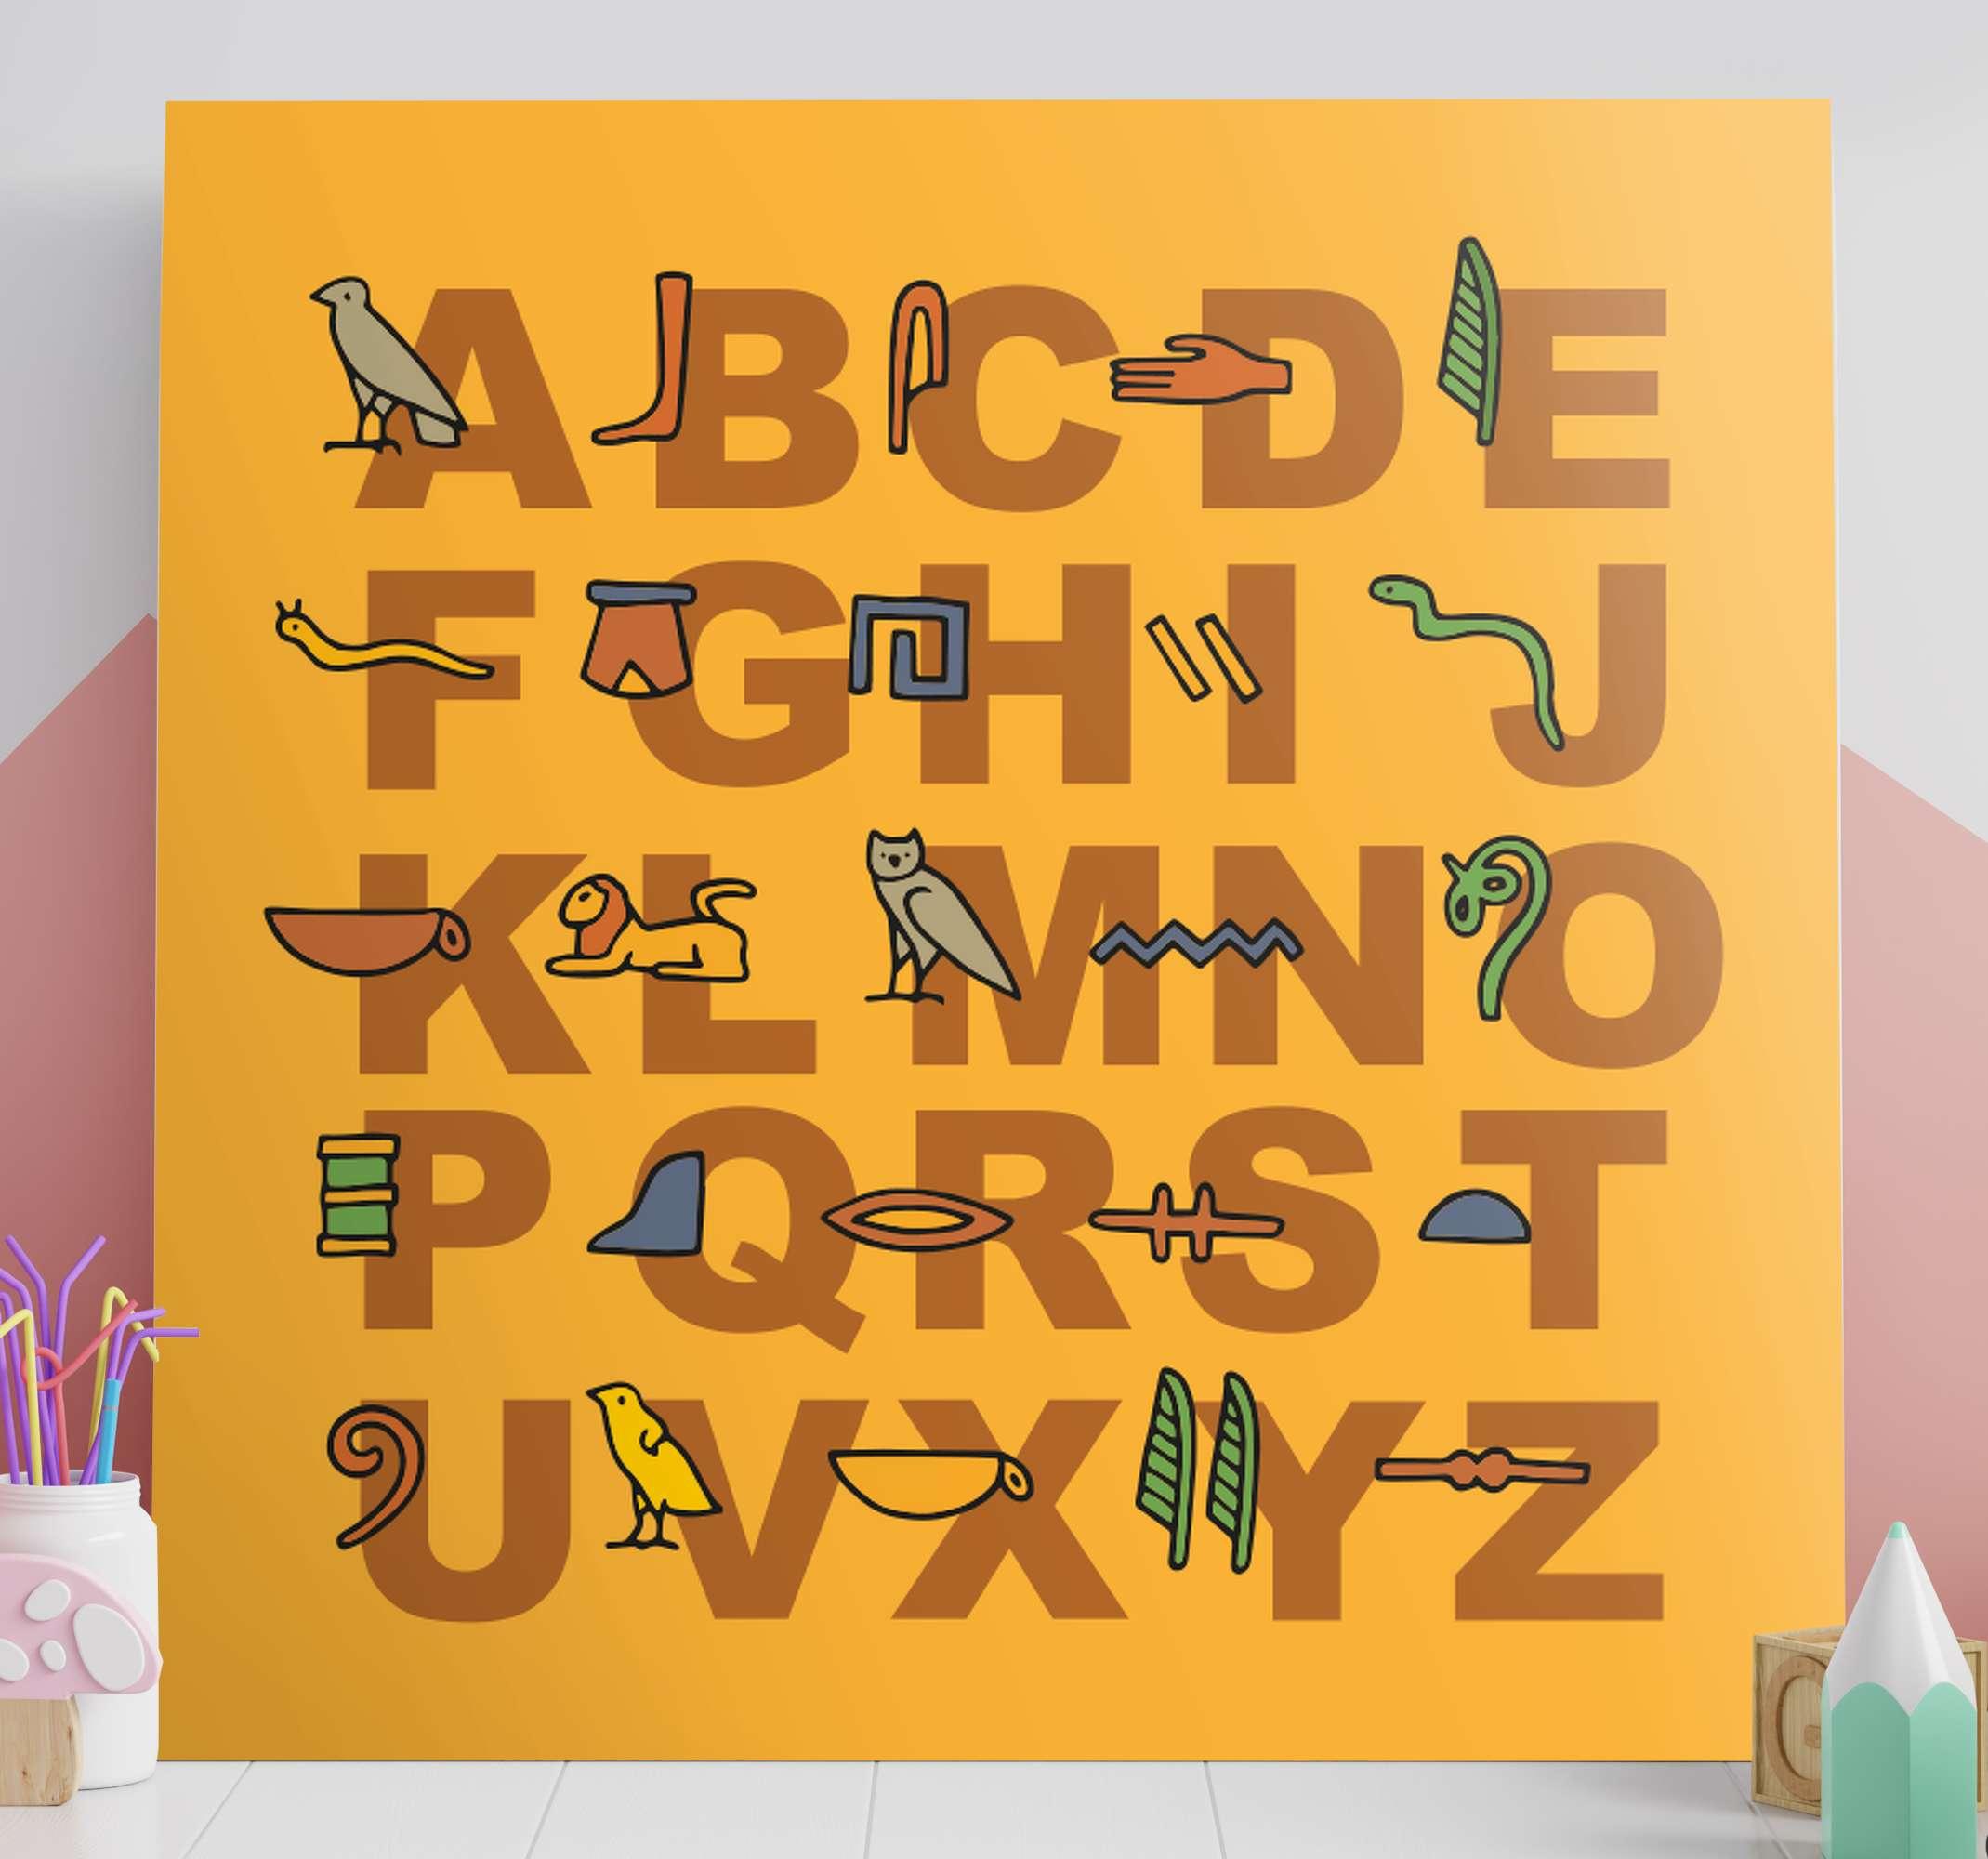 TenStickers. 埃及字母帆布墙艺术. 在这里,我们有一个报价画布艺术墙,它在橙色背景上描绘了埃及字母。立即将其添加到购物车!